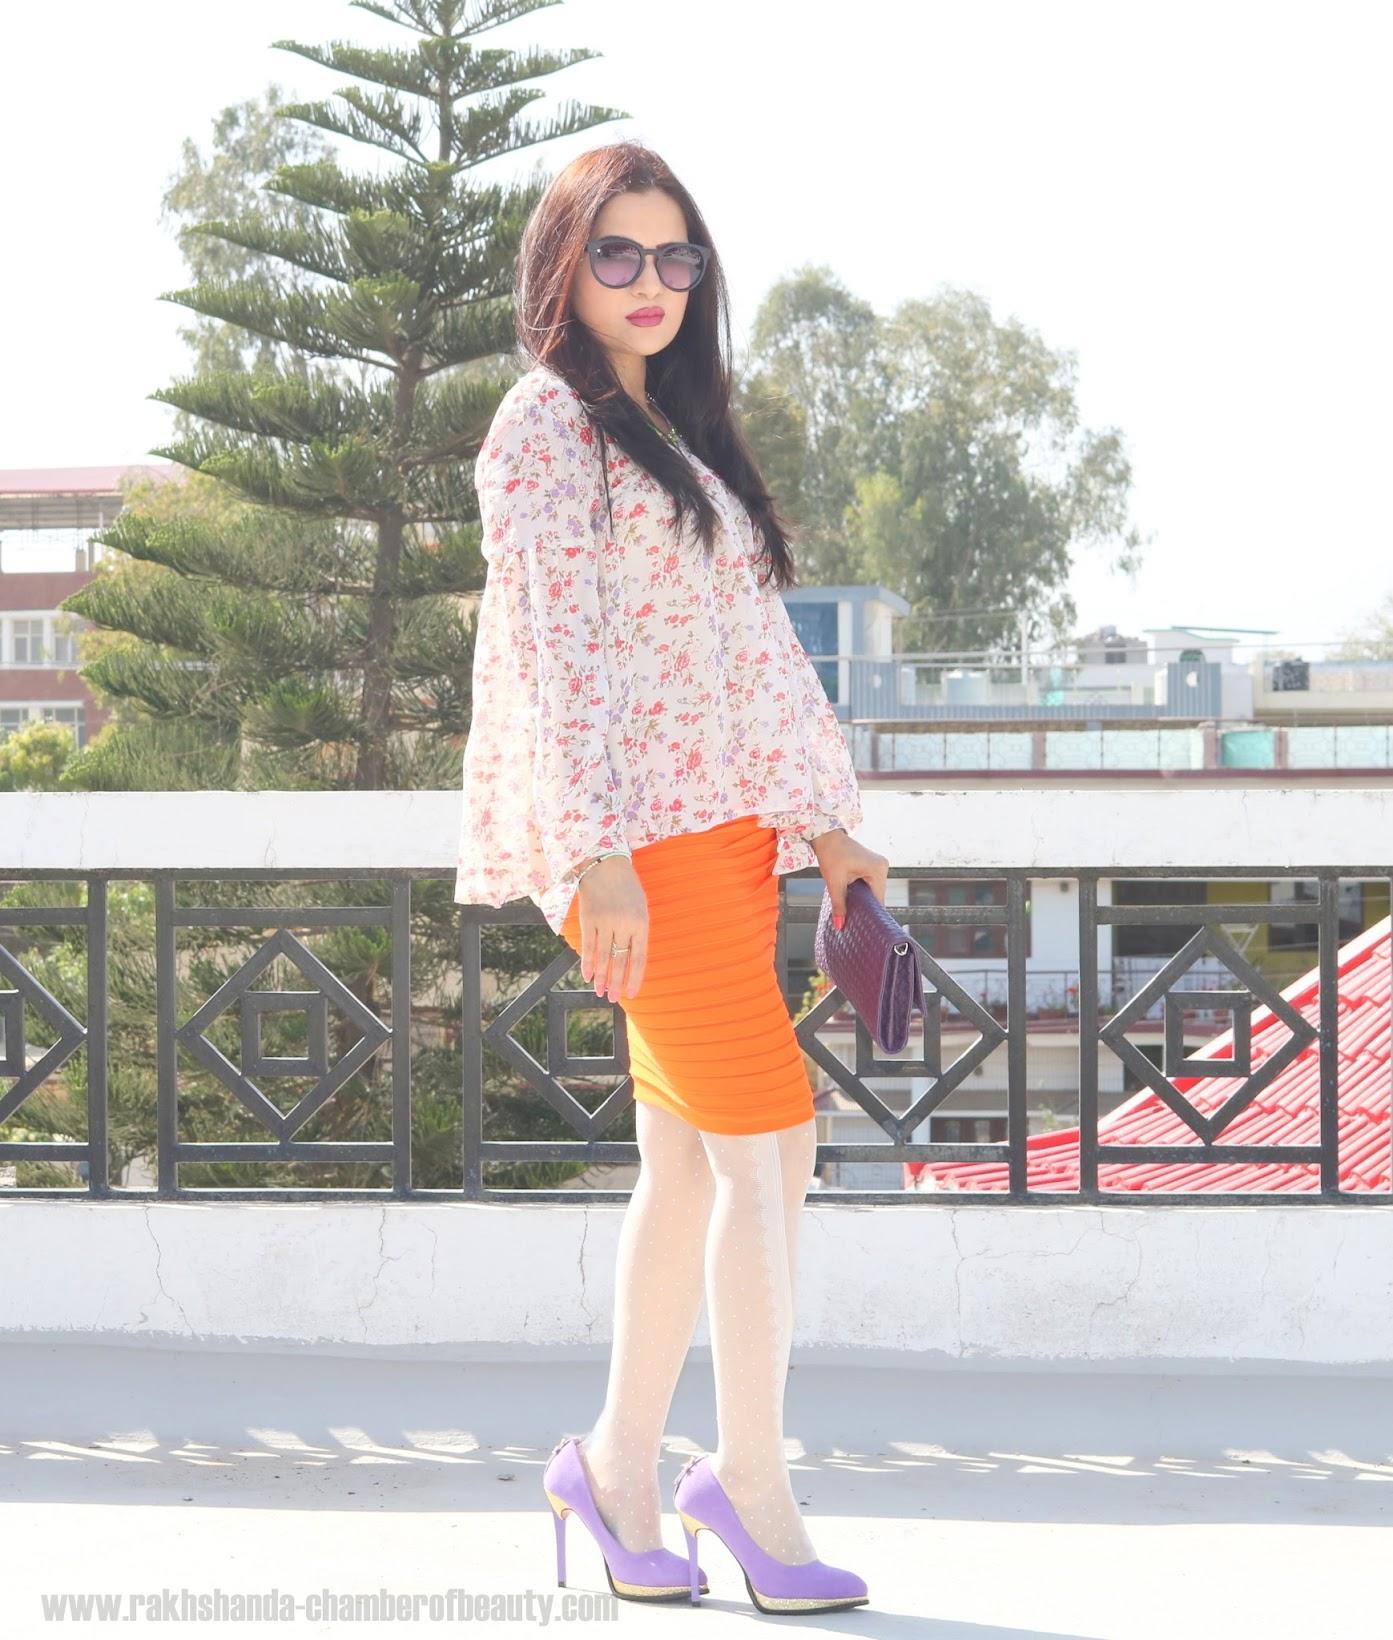 How to wear florals in spring, Floral prints for spring, Lara Karen Floral blouse from jabong.com, Online shopping from jabong